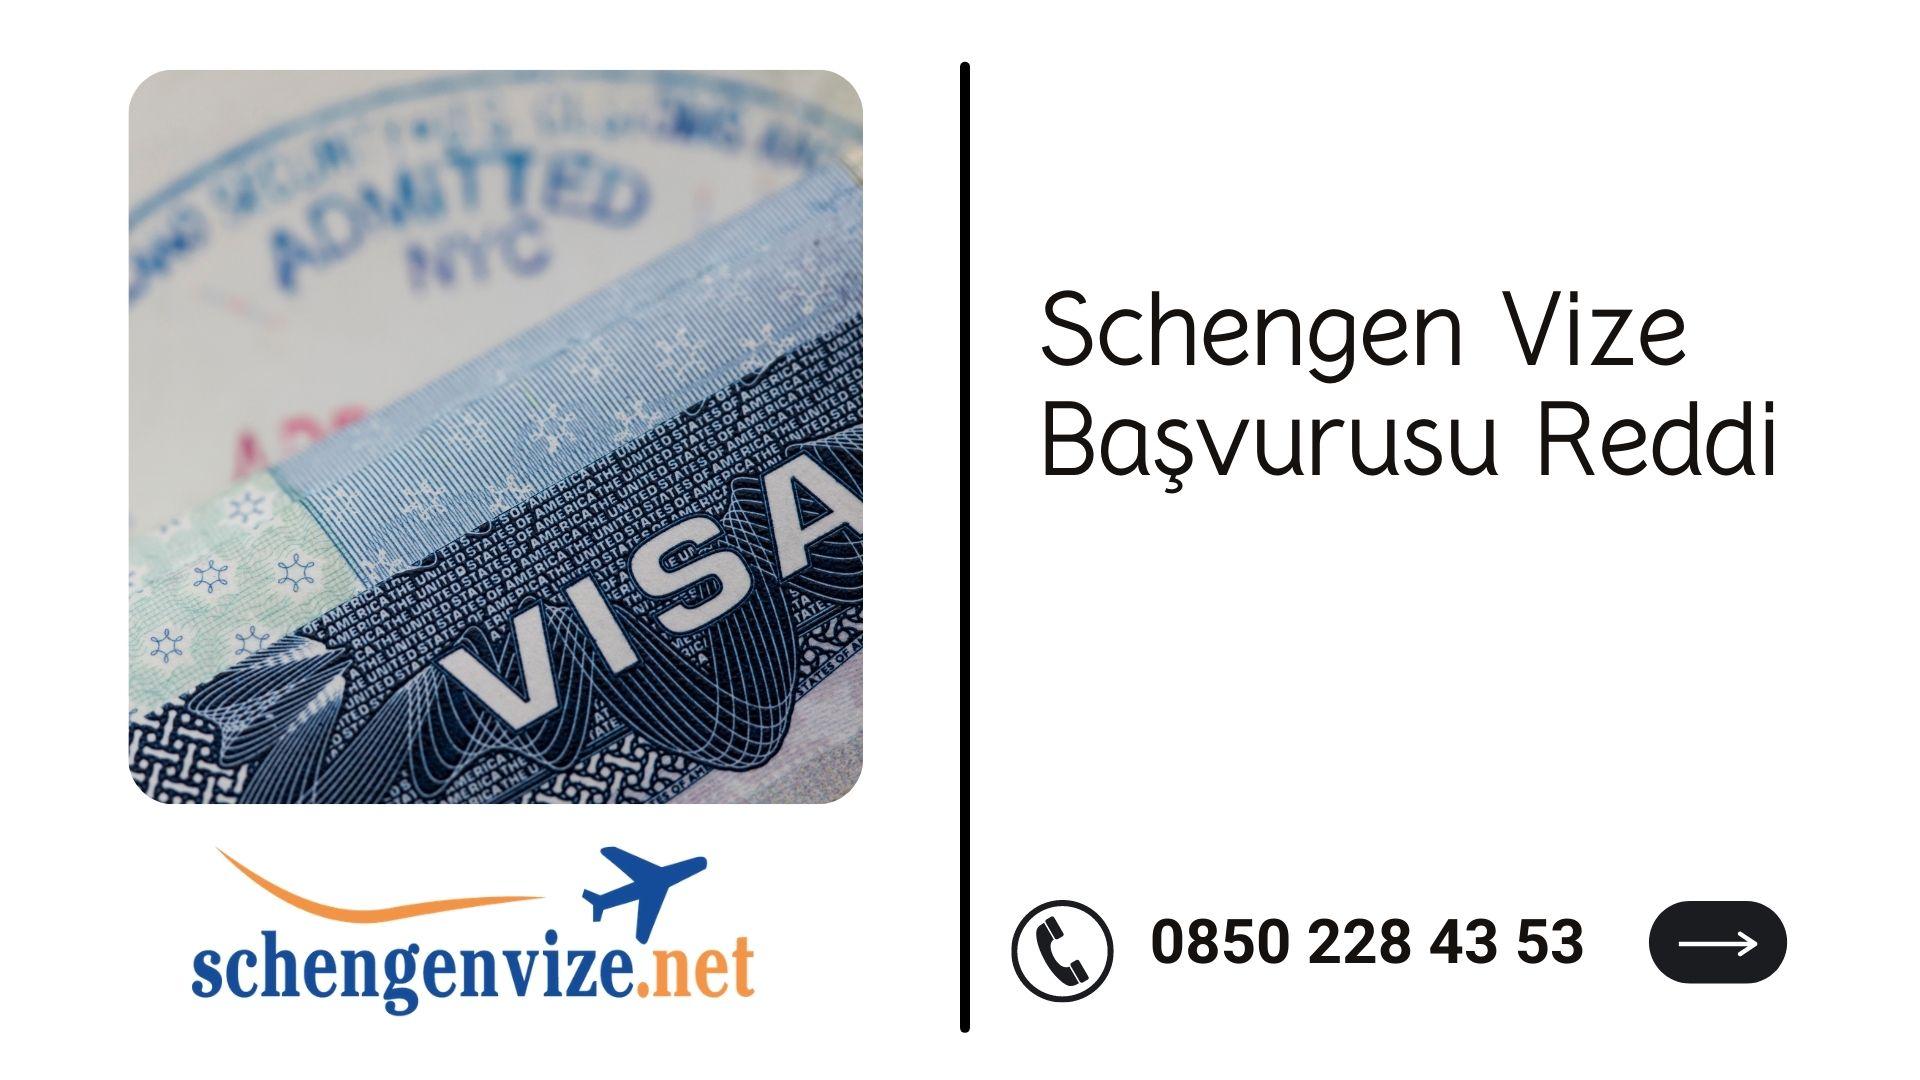 Schengen Vize Başvurusu Reddi